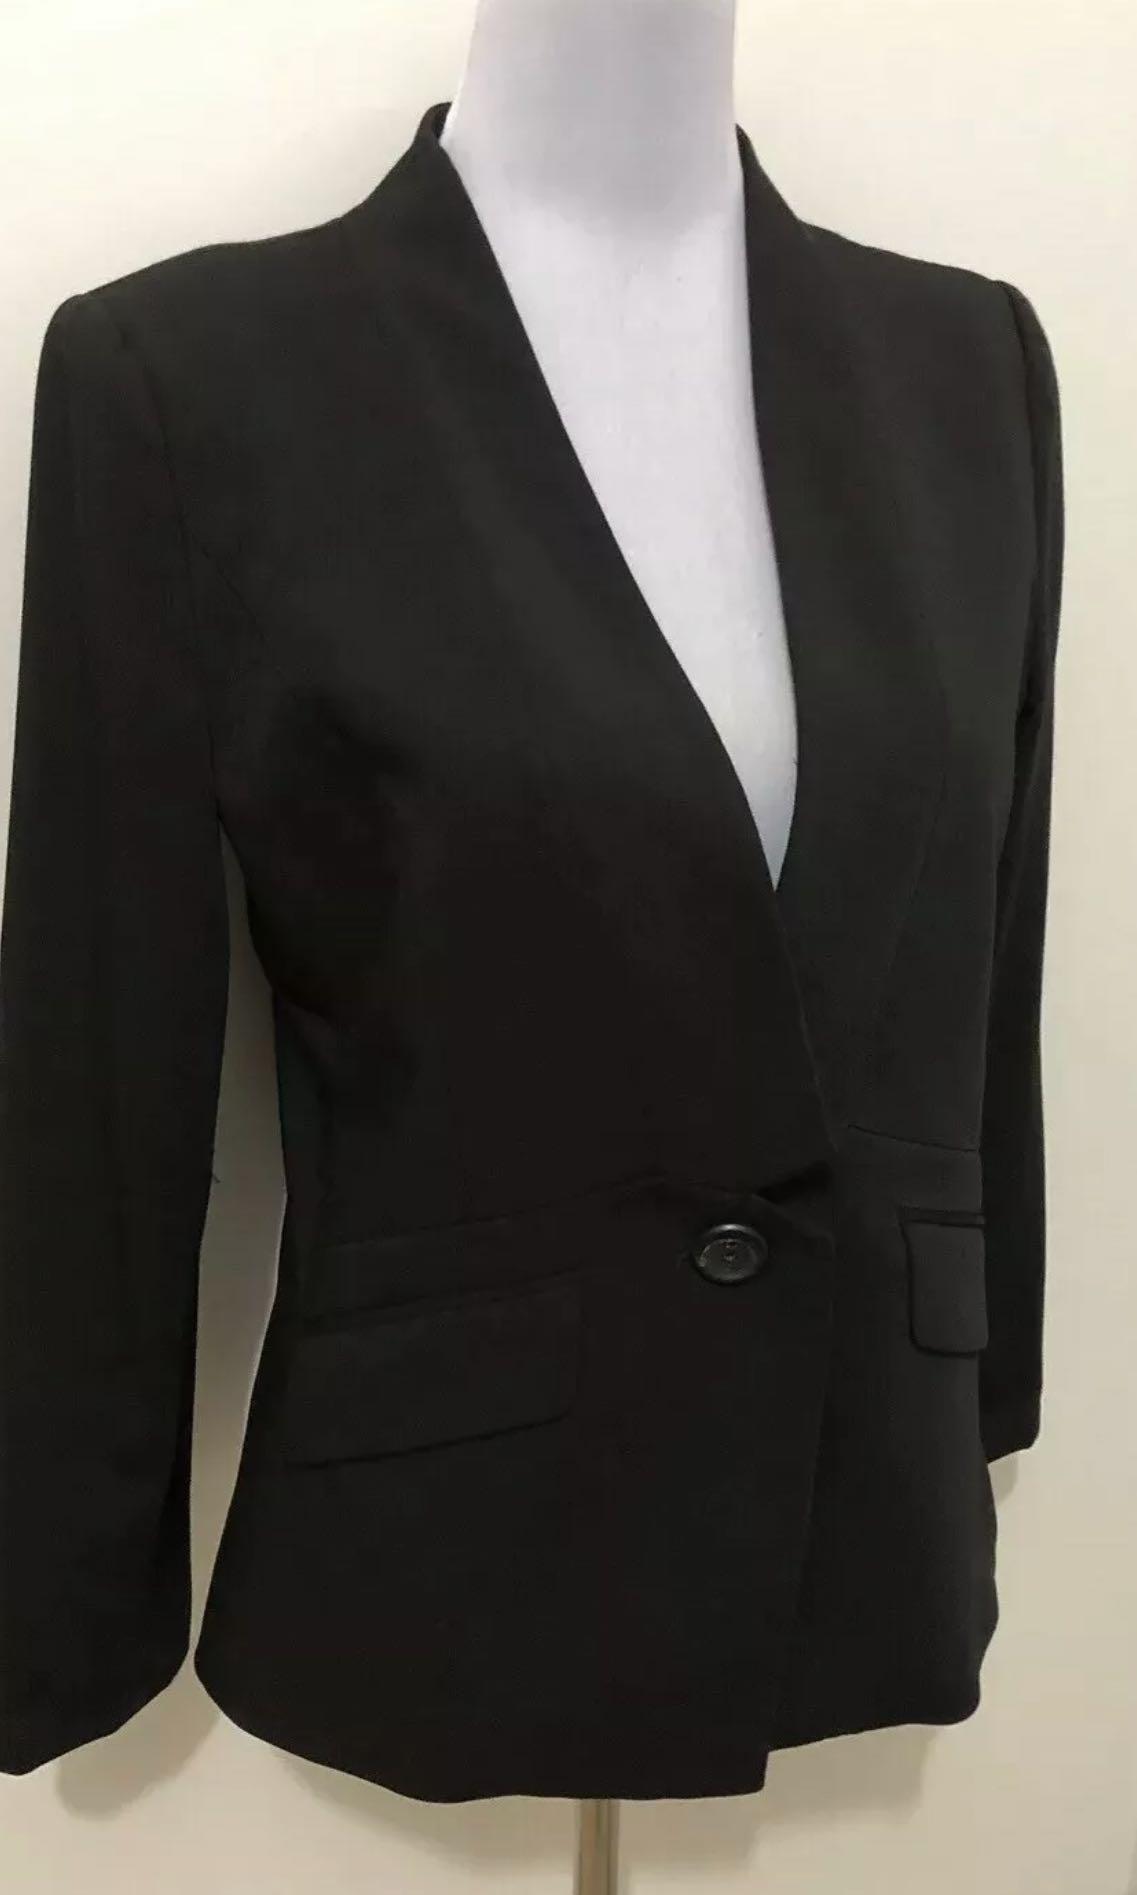 Ladies VERONIKA MAINE Black Lined Stretch Blazer.  Size 8. EUC